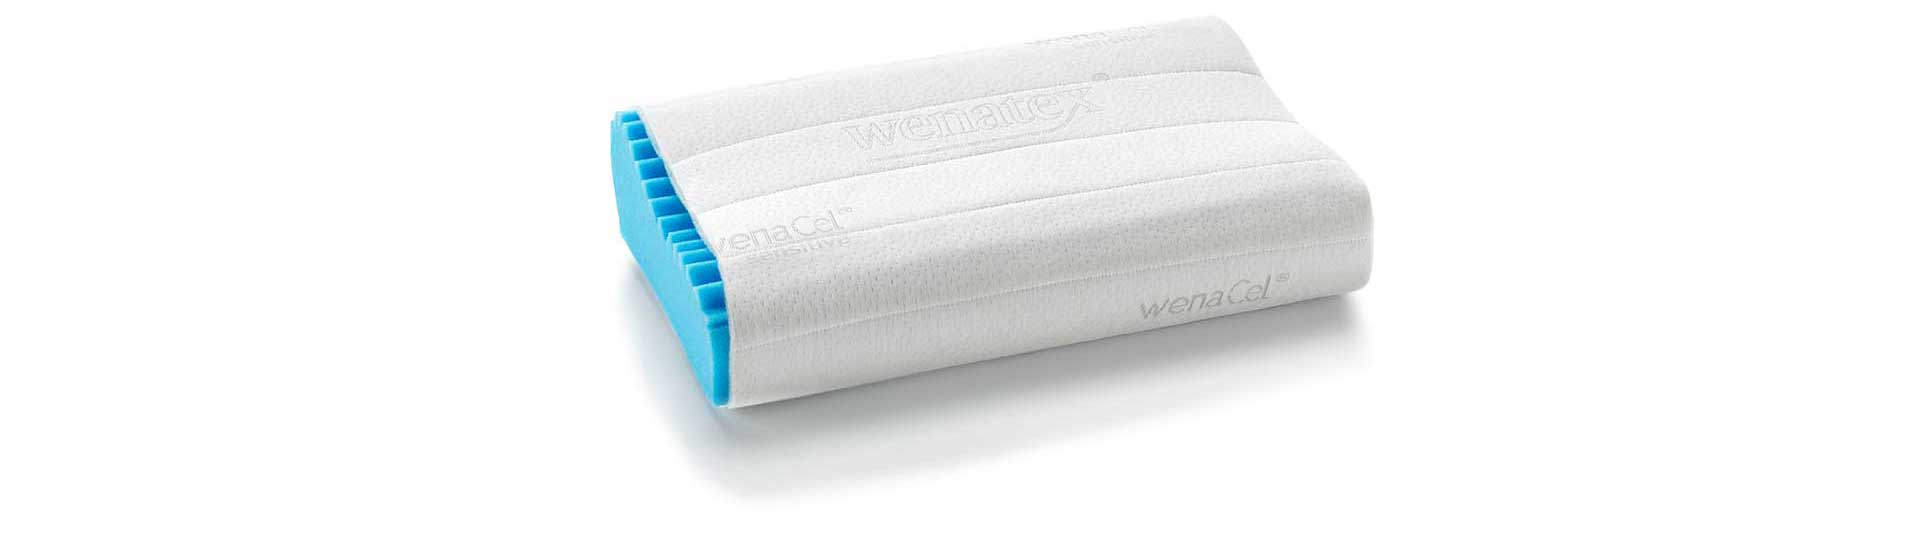 Cuscini Wenatex.Wenacel Sensitive Orthopaedic Pillow Ergonomic Design For